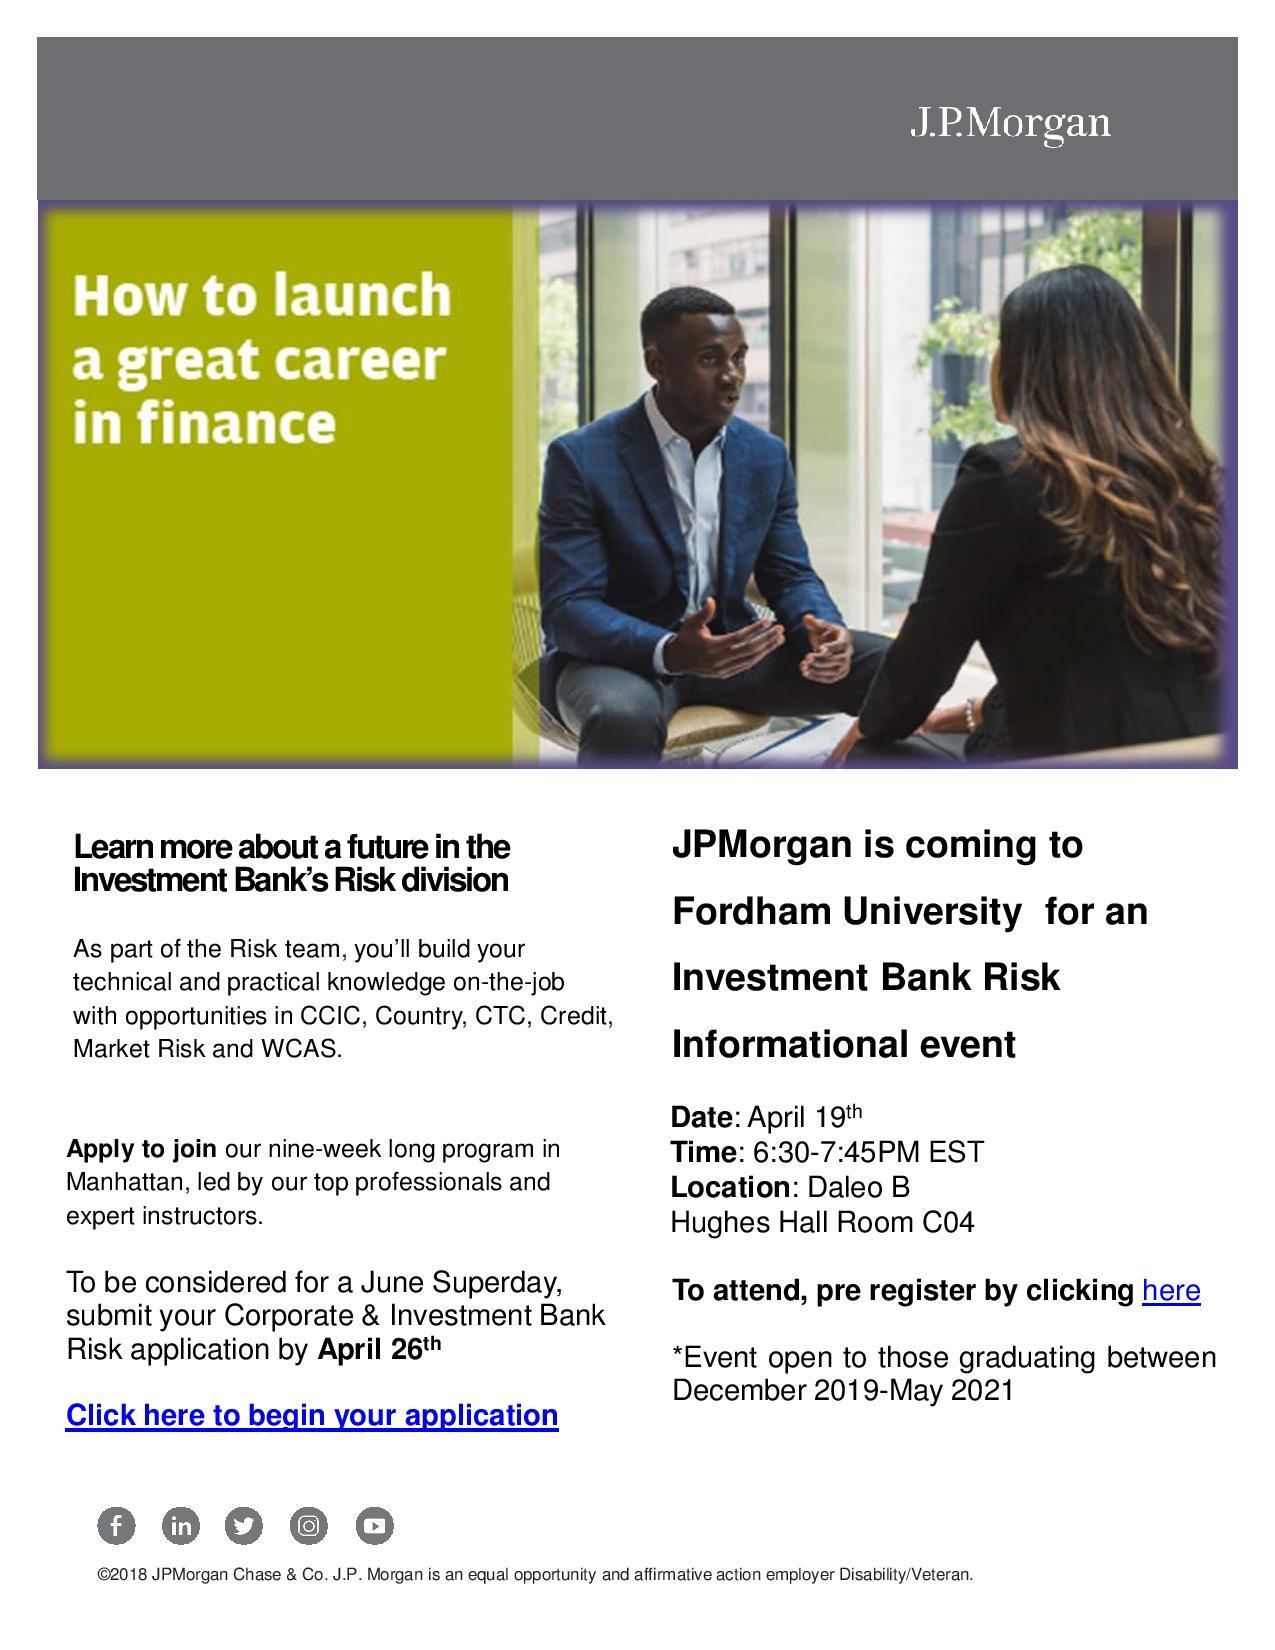 U) JPMorgan: How to Launch a Great Career in Finance